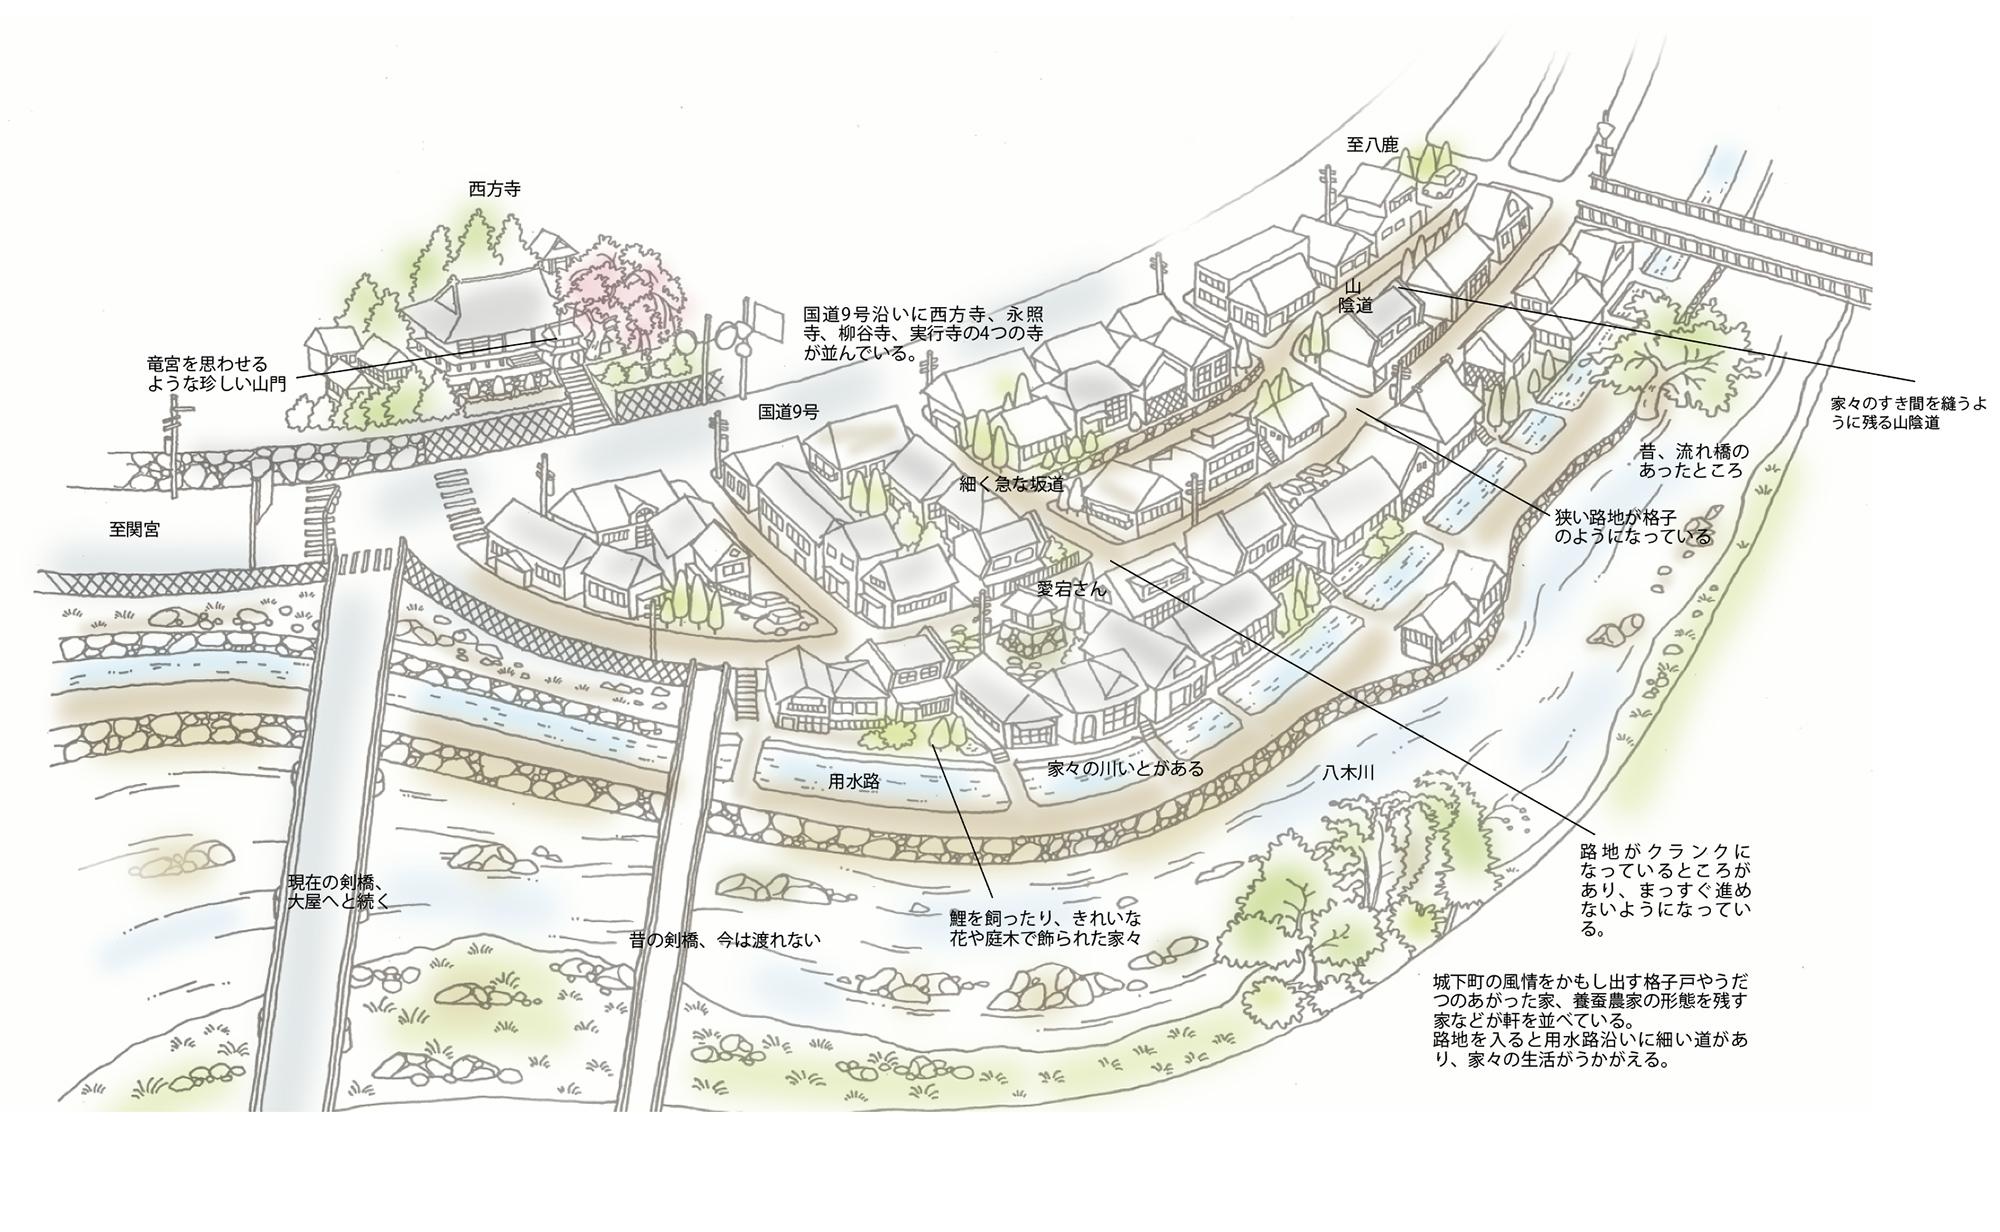 八木城下を歩く<養父市八鹿町八木>(Vol.50/2004年4月発行)